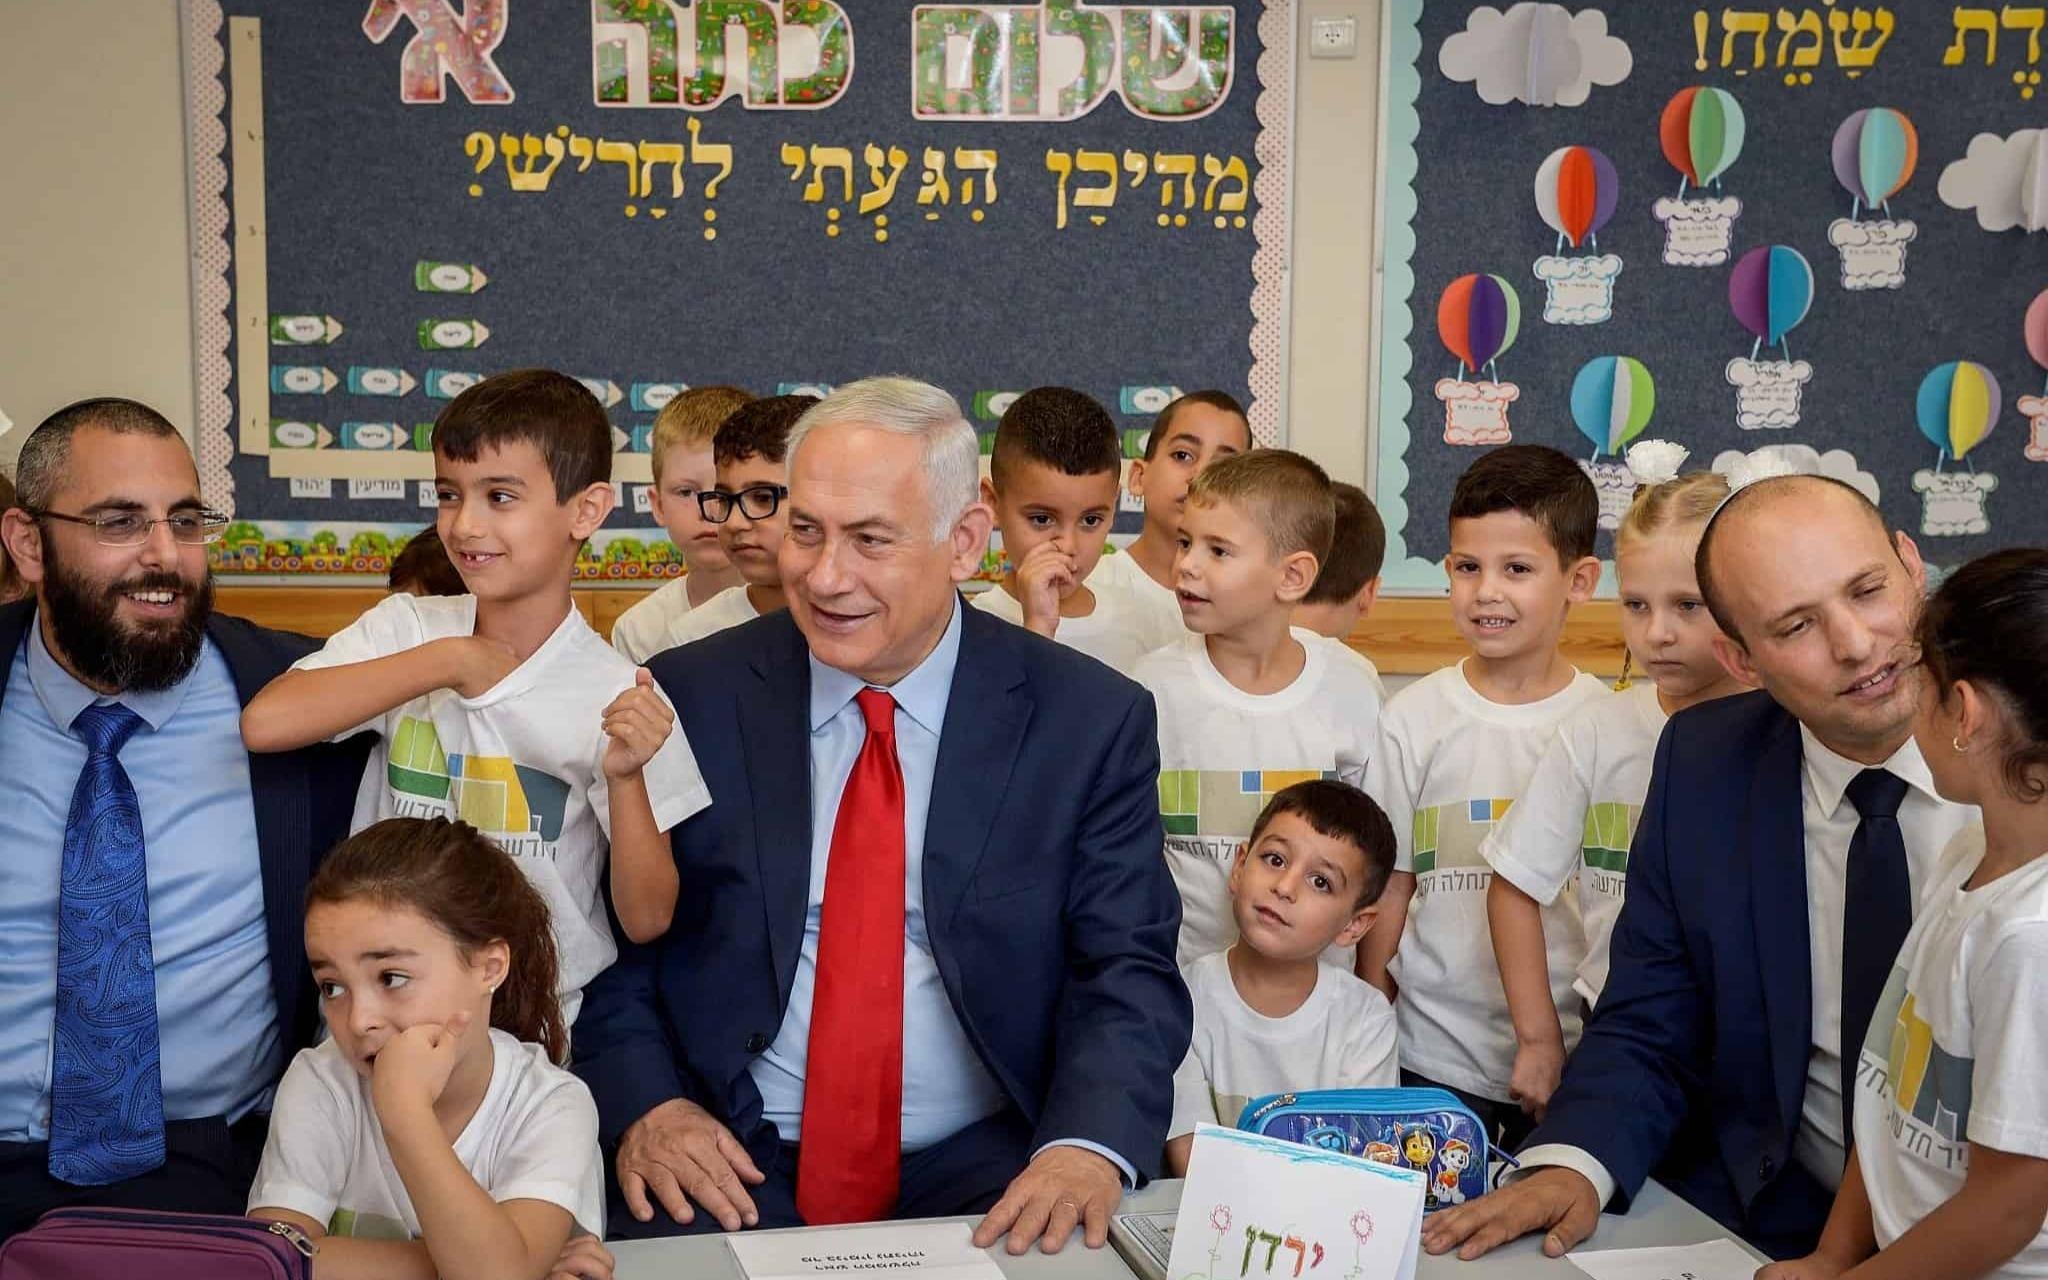 Prime Minister Benjamin Netanyahu with Harish school children on September 1. (Photo: Avi Ohayon/GPO)